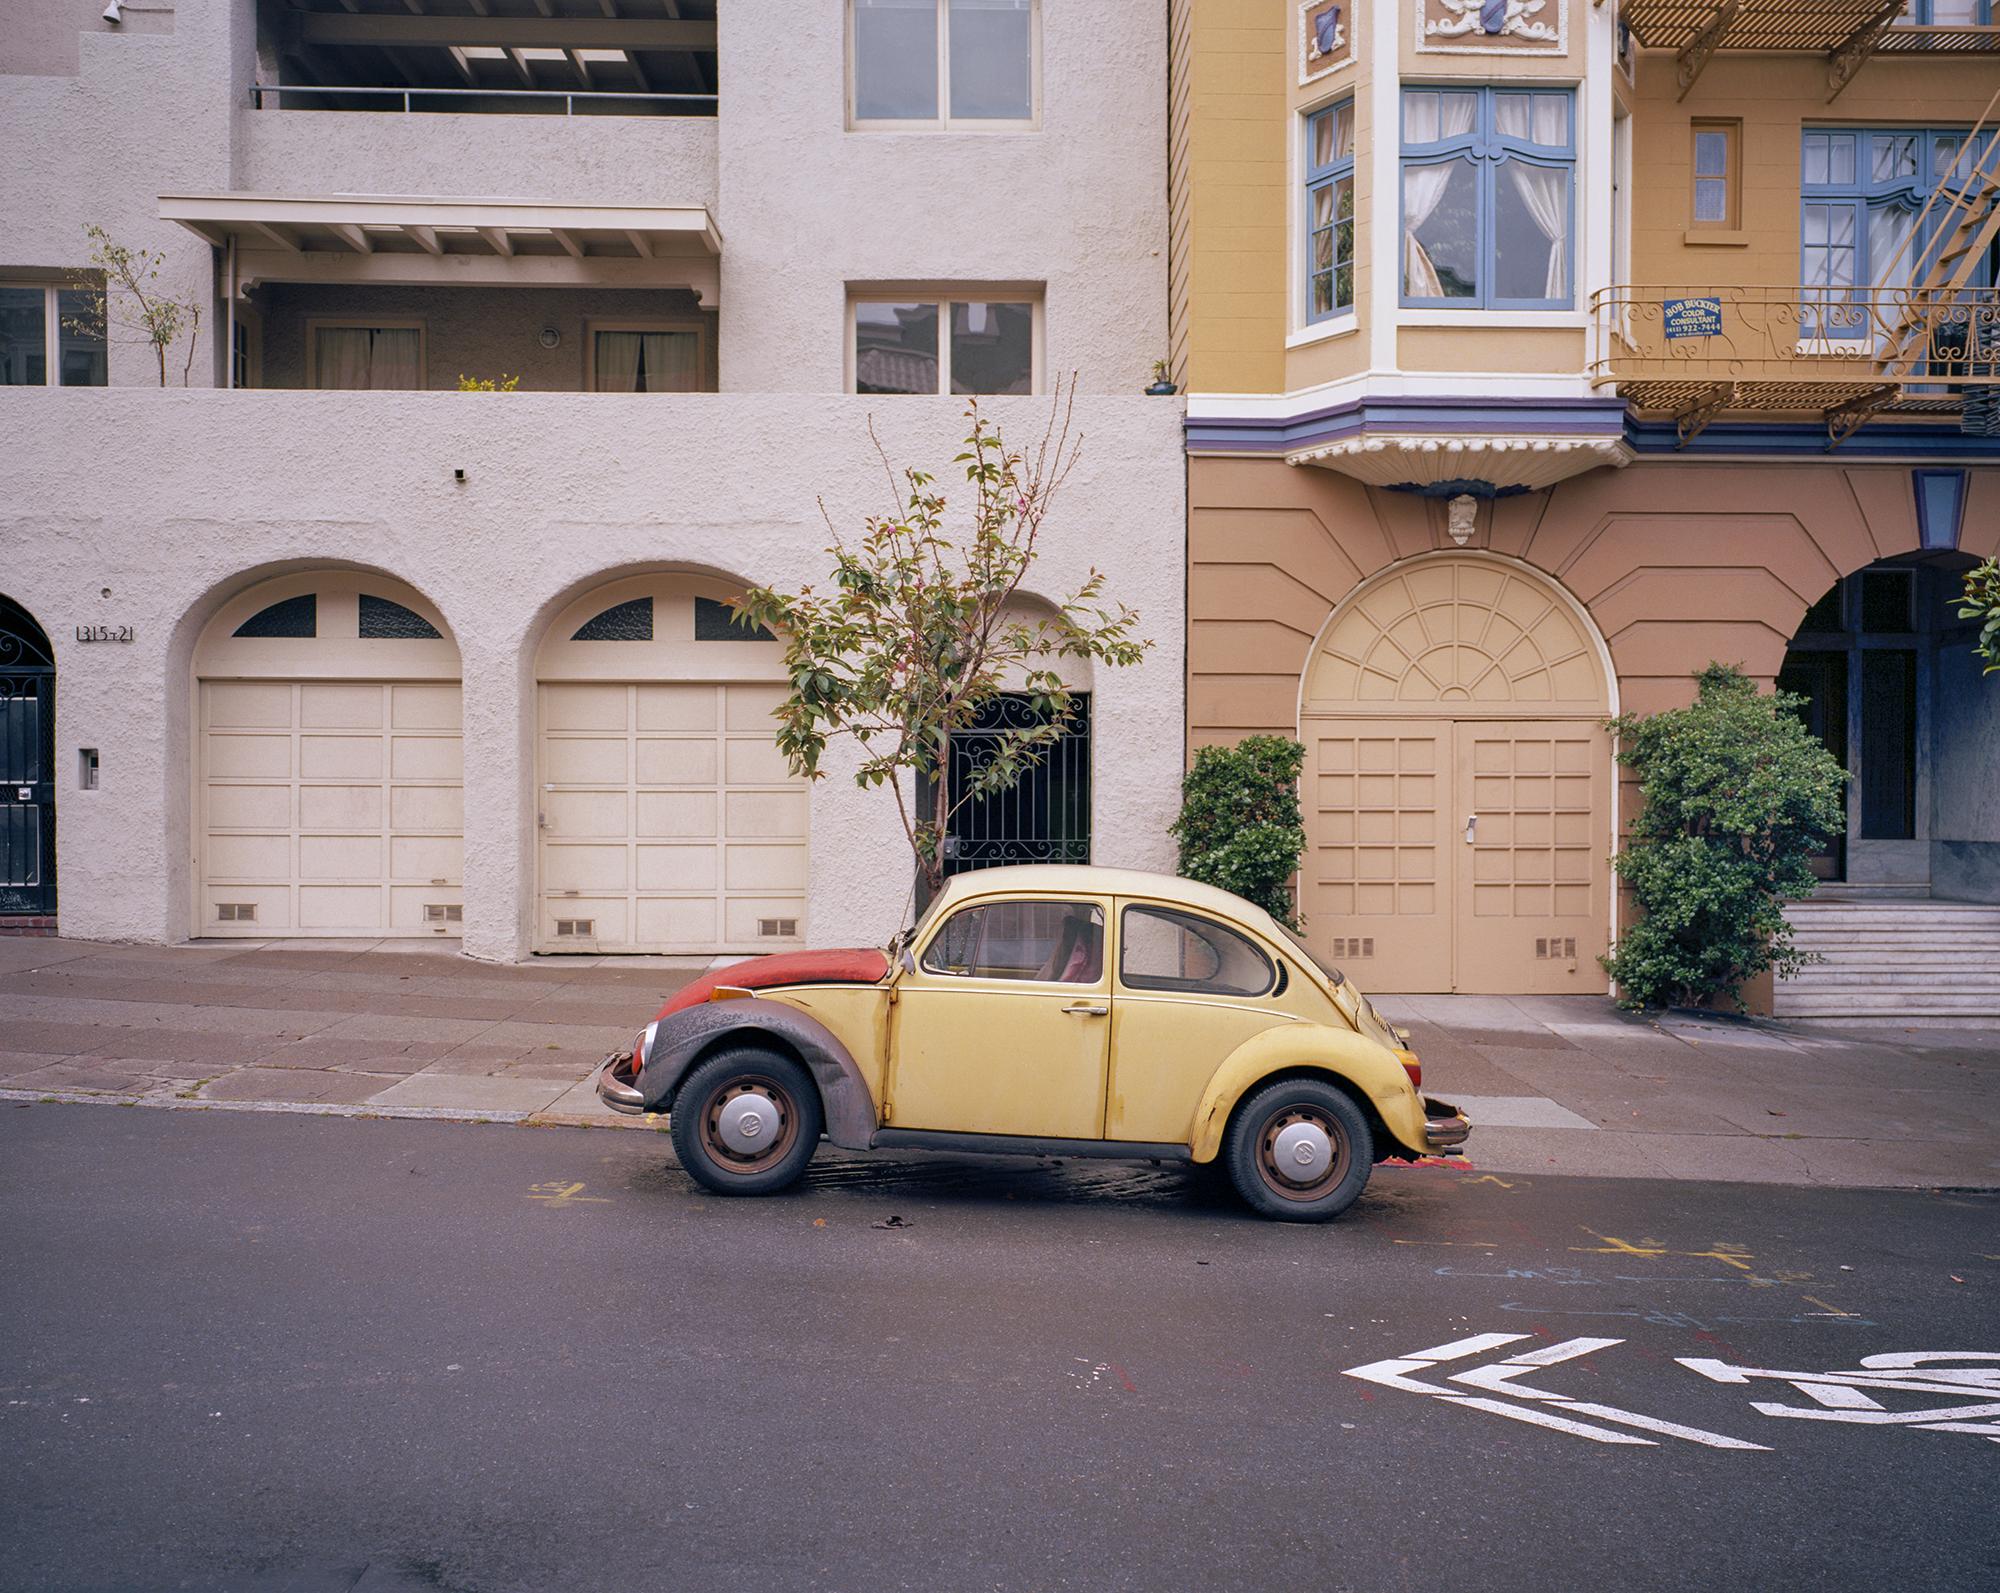 San Francisco, California. June 2015.